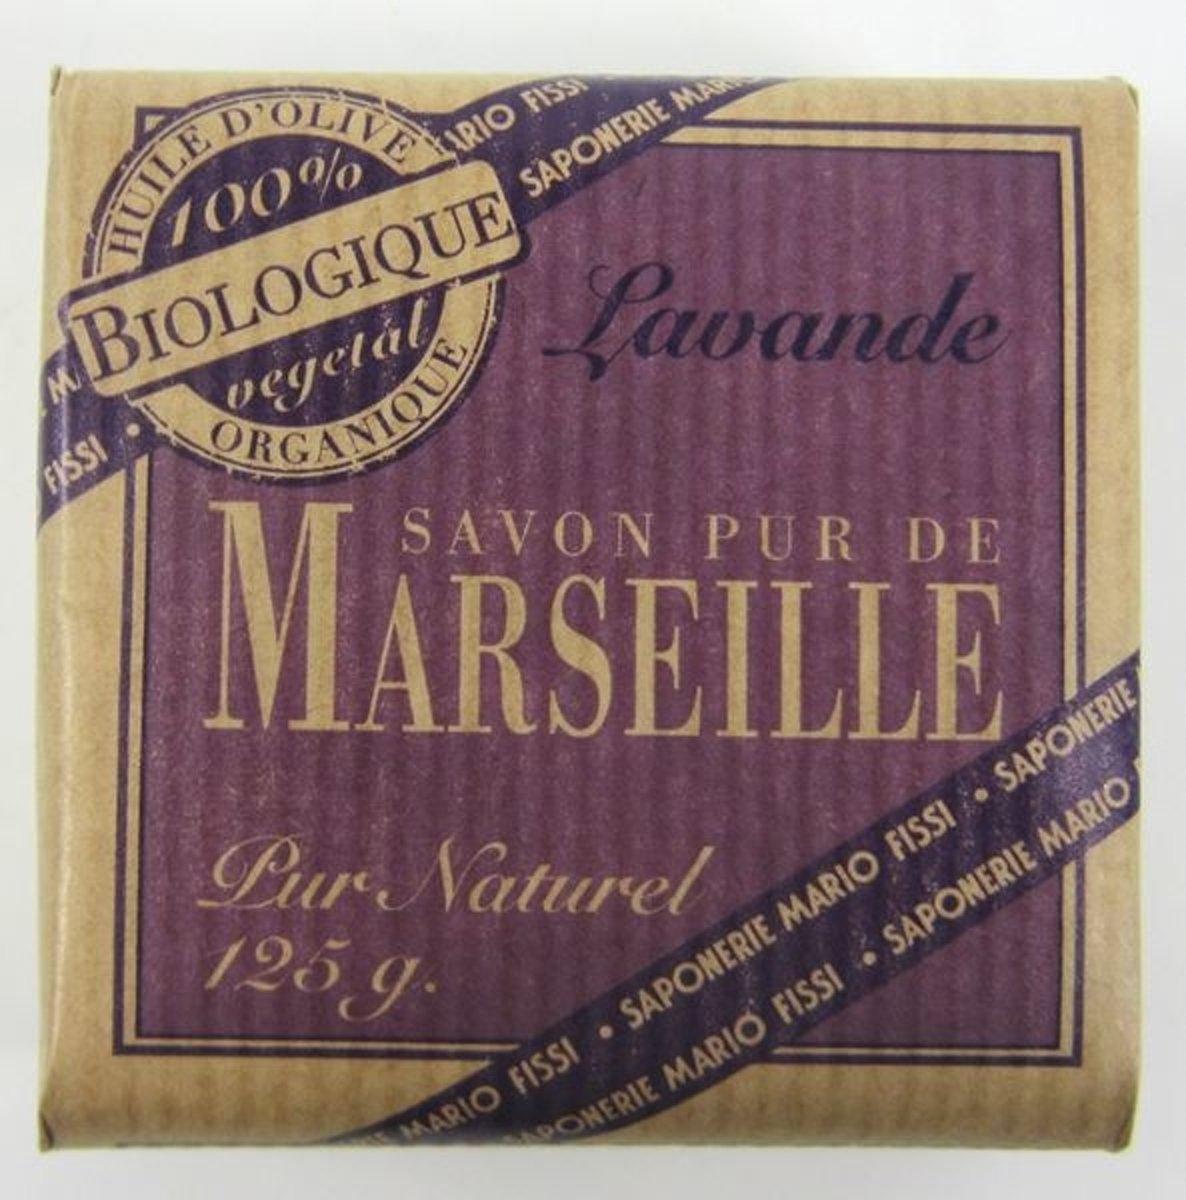 organic marseille biologische zeep lavendel 125 gr 8003085306670 prijs. Black Bedroom Furniture Sets. Home Design Ideas